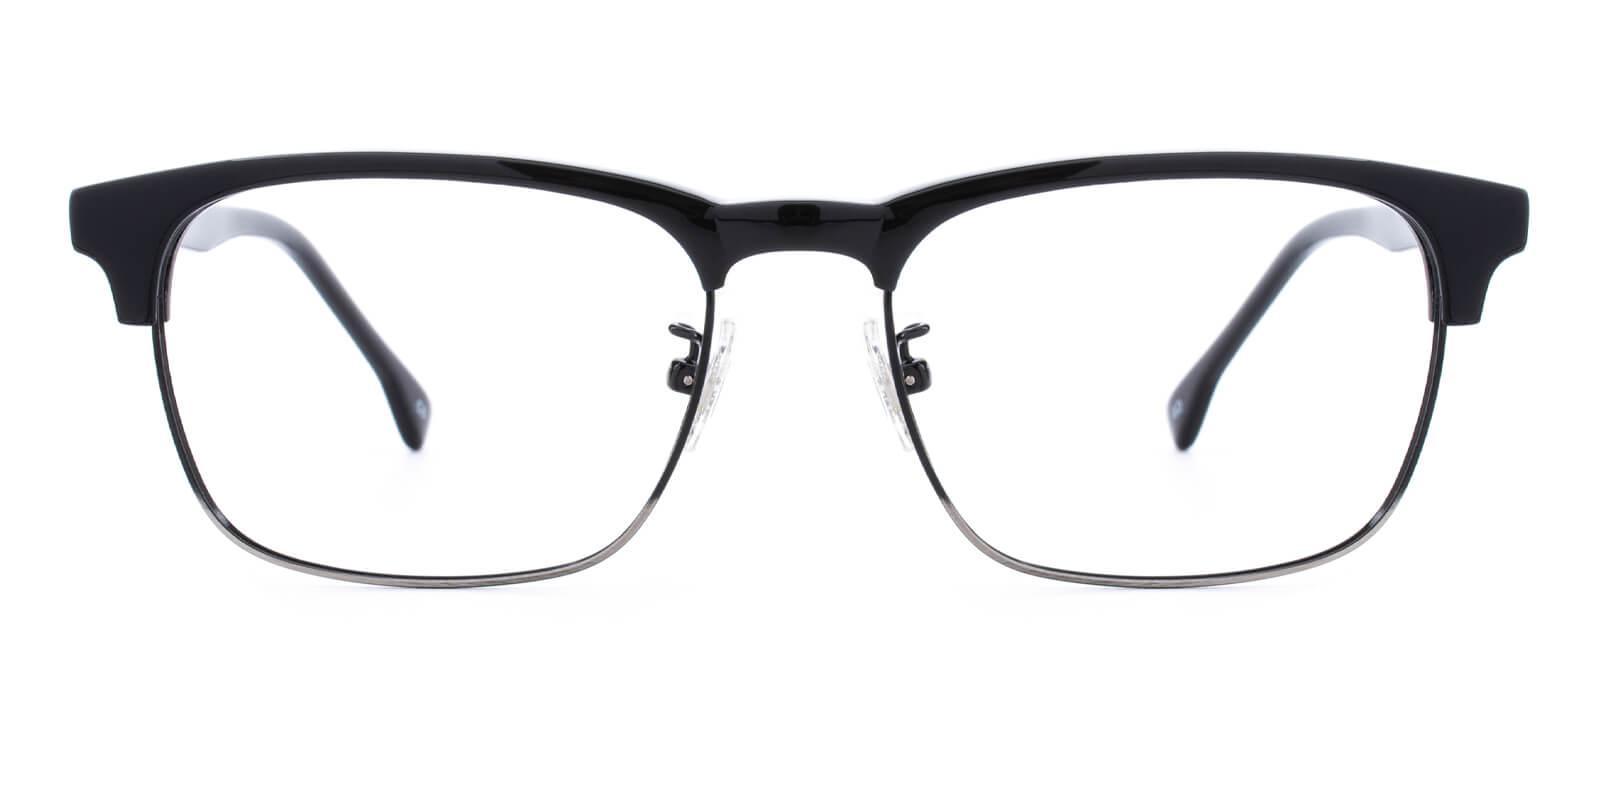 Sublime-Black-Browline-Combination-Eyeglasses-additional2